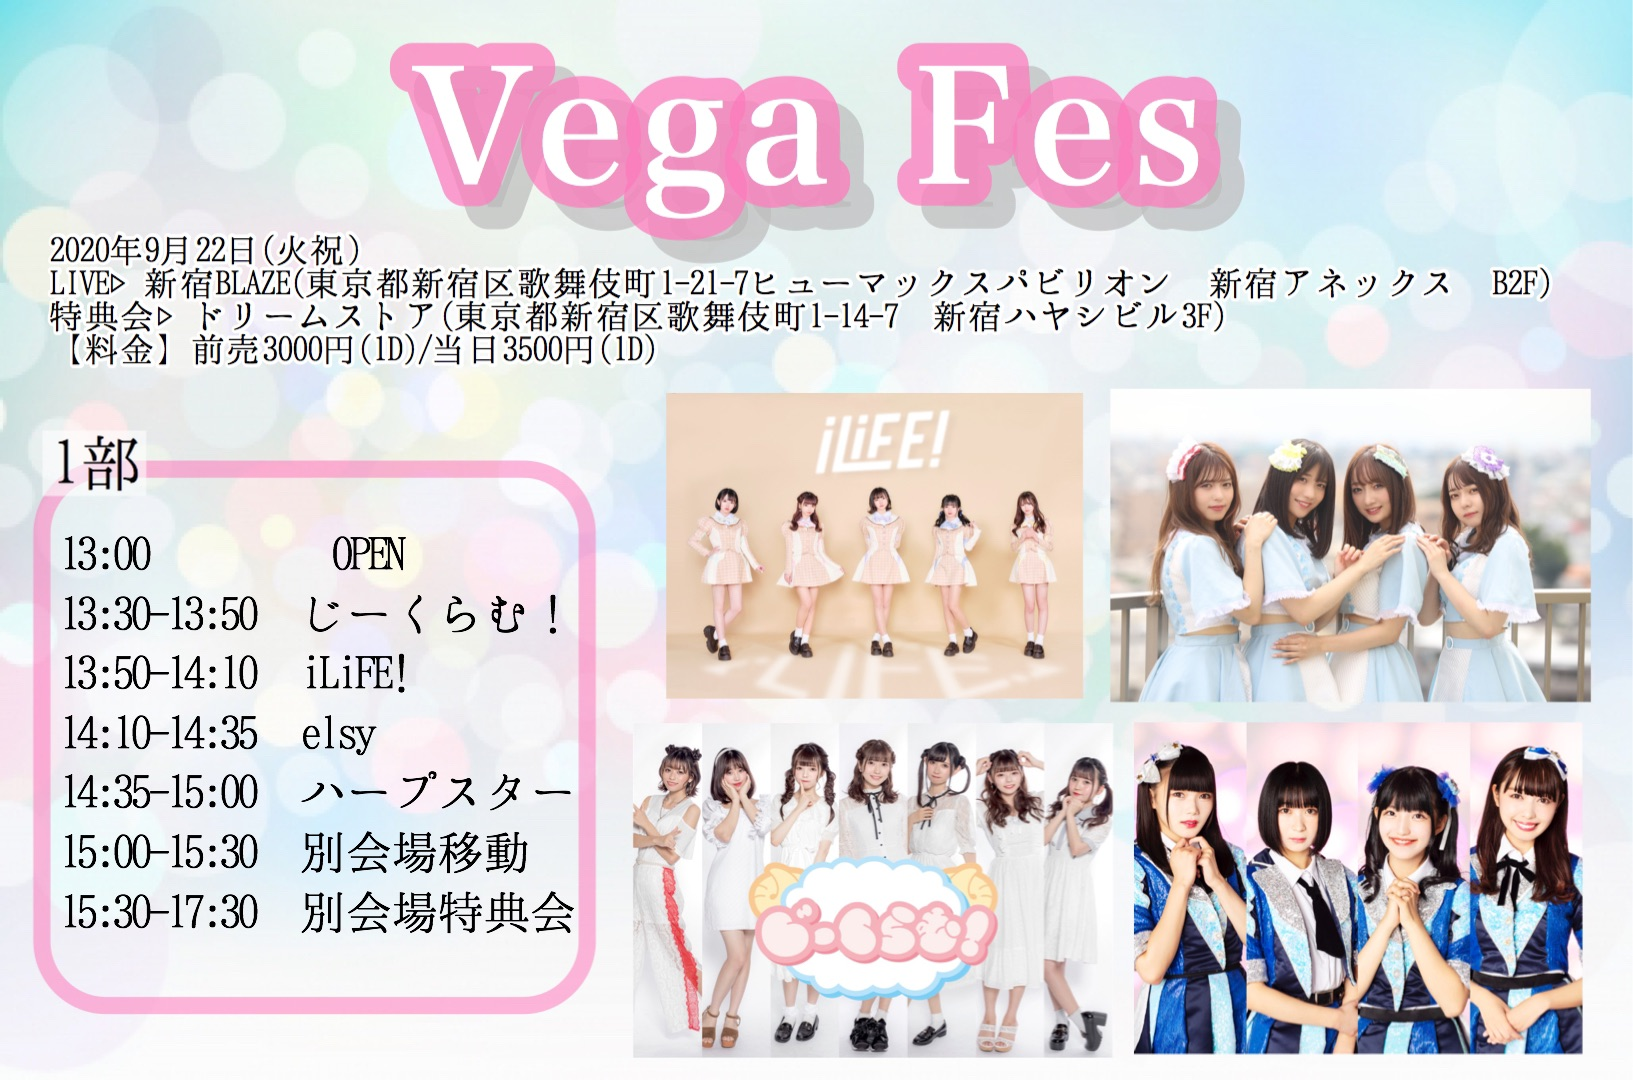 Vega Fes